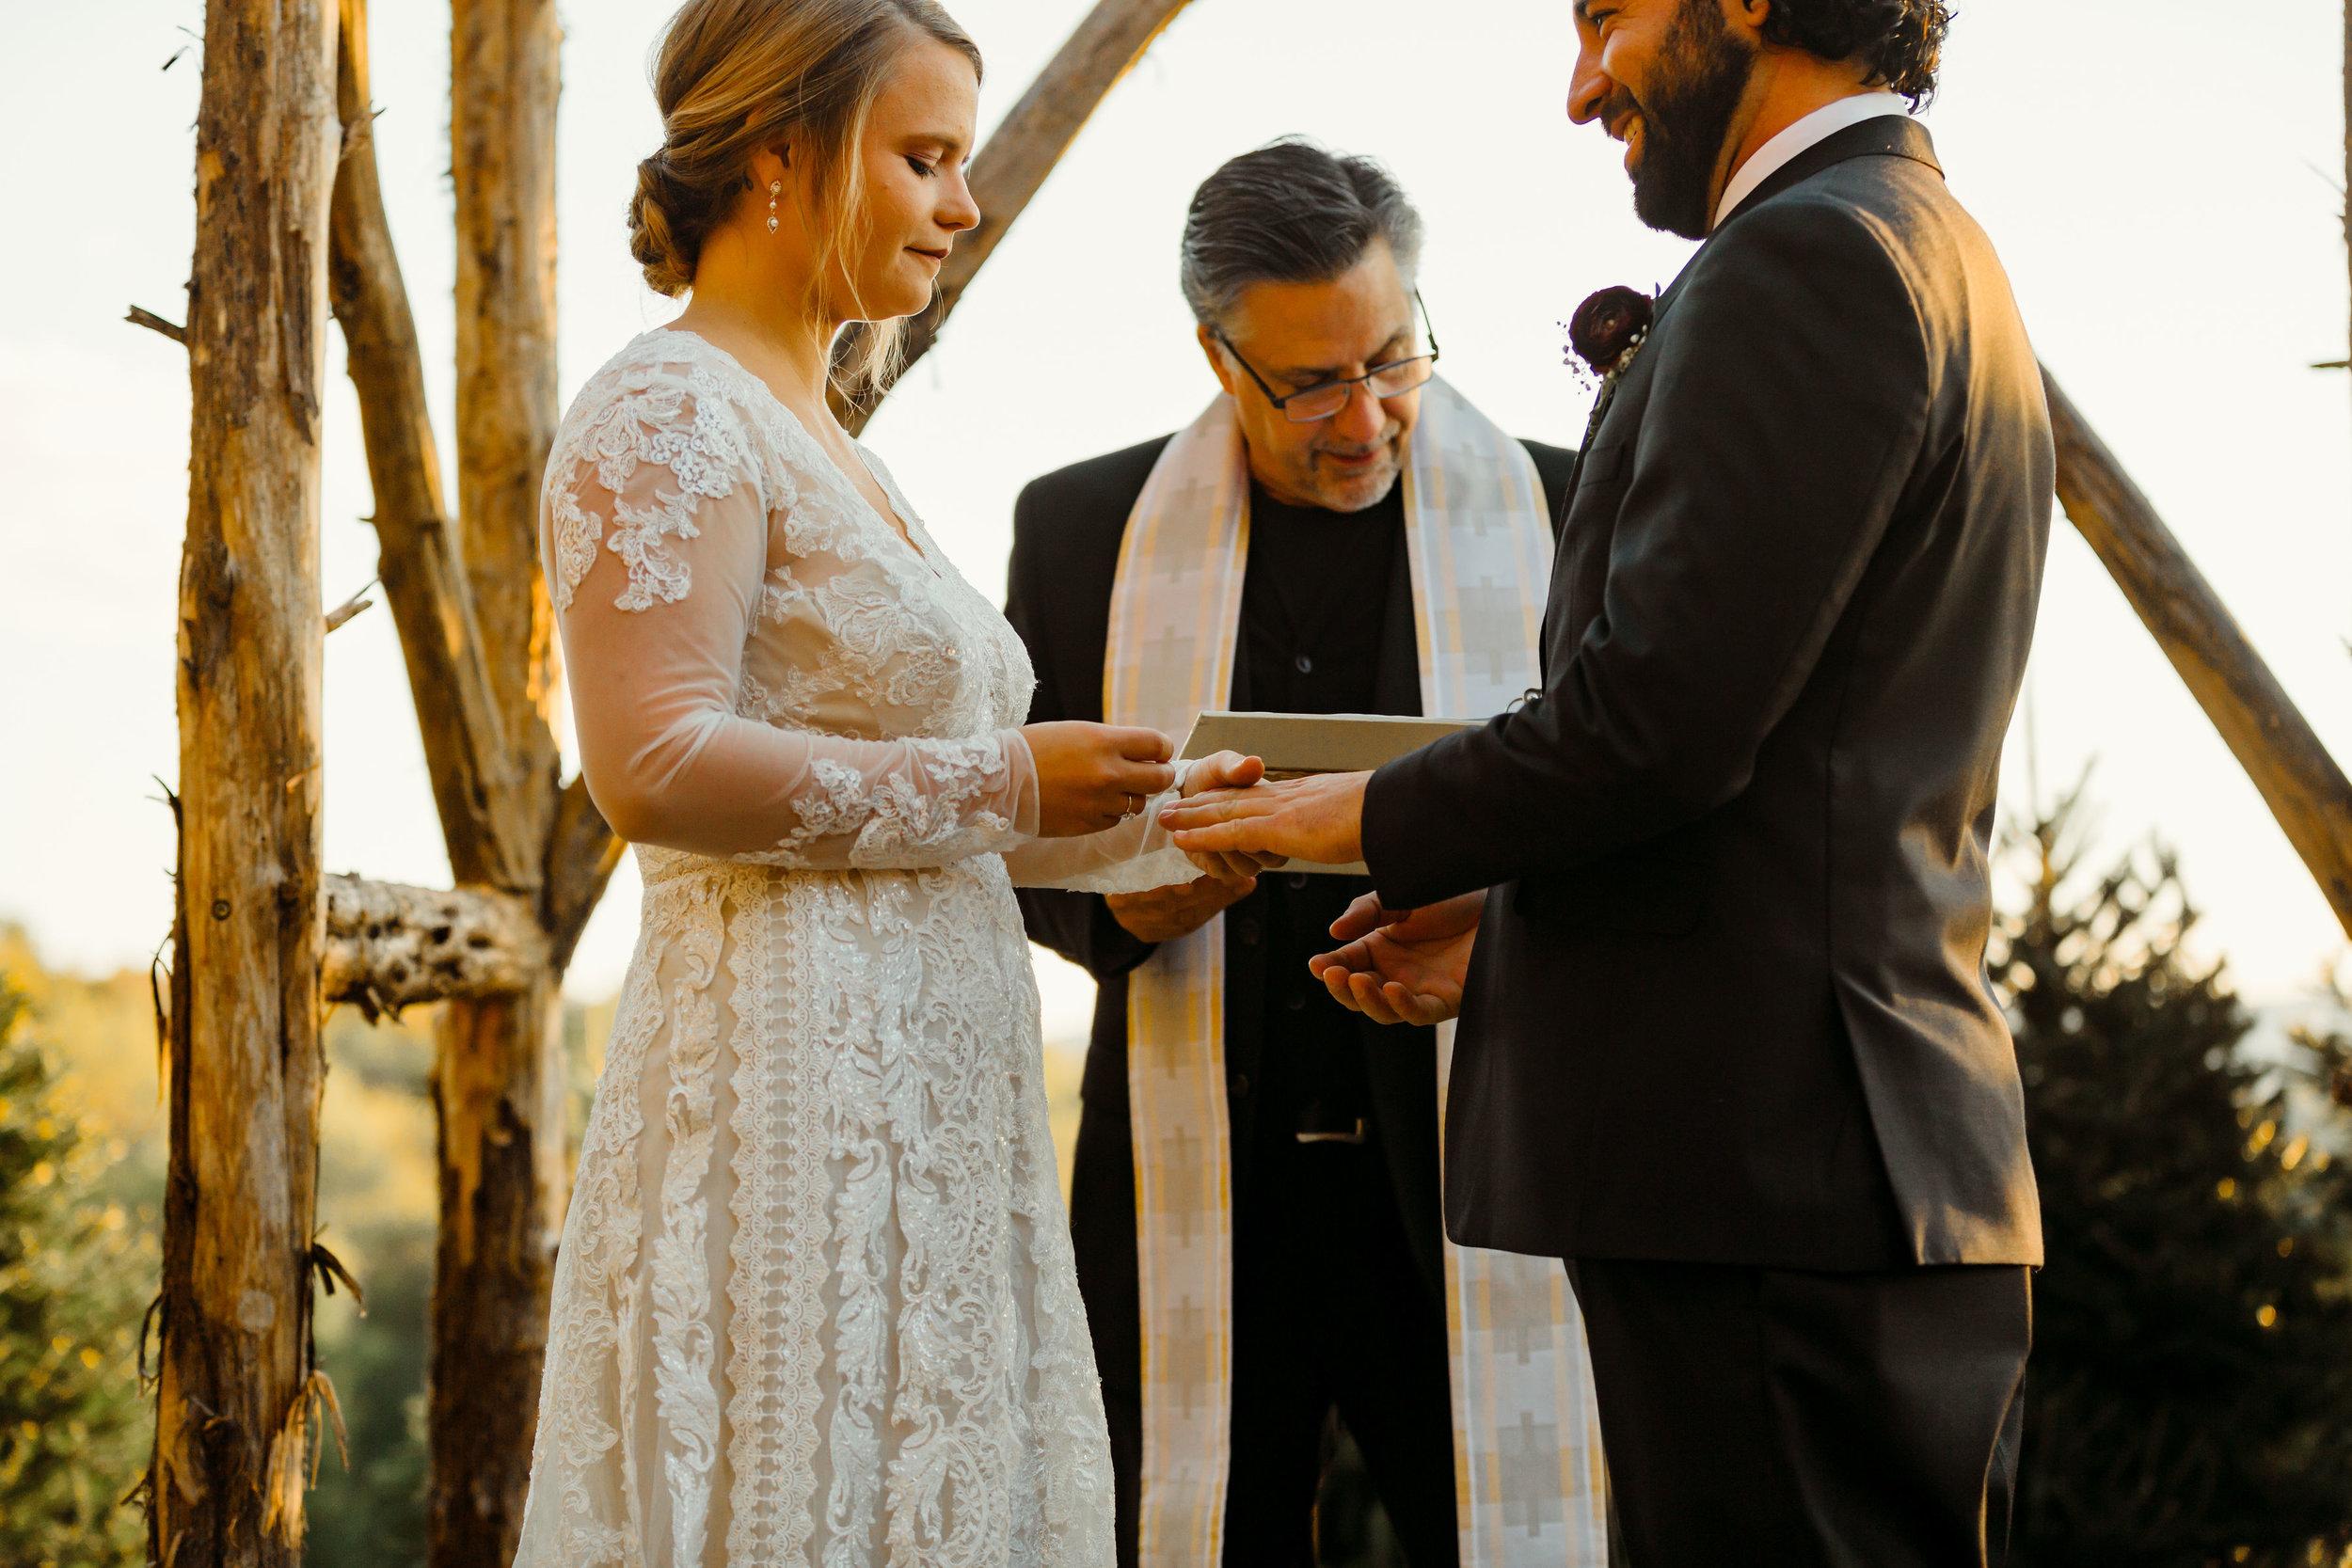 young-love-media-rustic-fall-autumn-wedding-emmerich-tree-farm-hudson-valley-warwick-new-york-ceremony-199.jpg